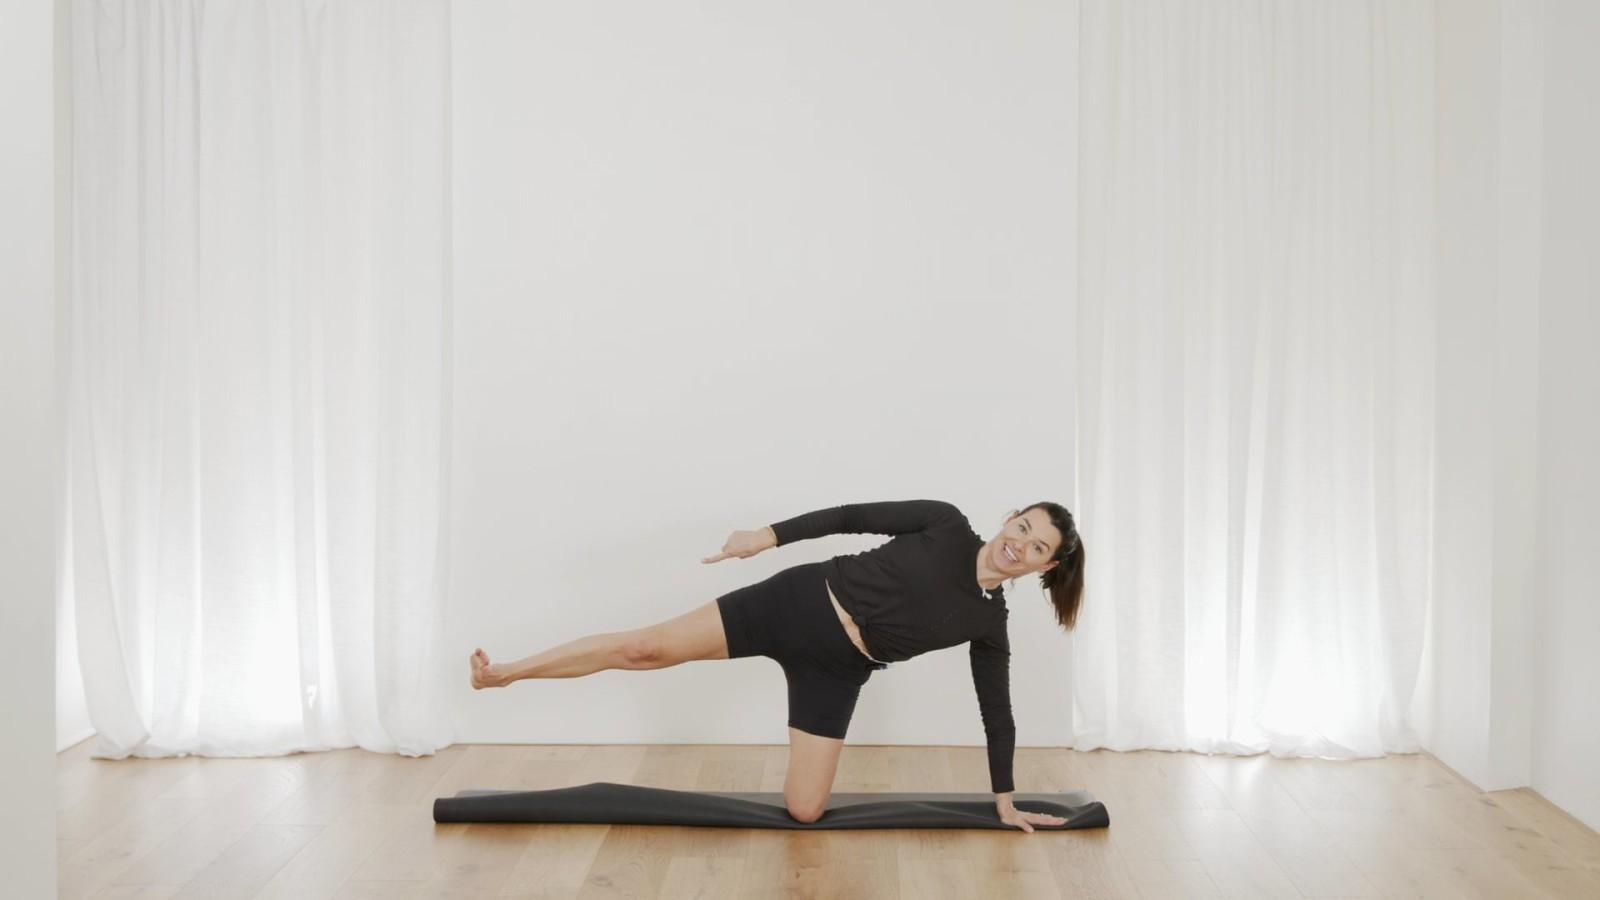 Express Full Body Workout with Aneta Bachanova